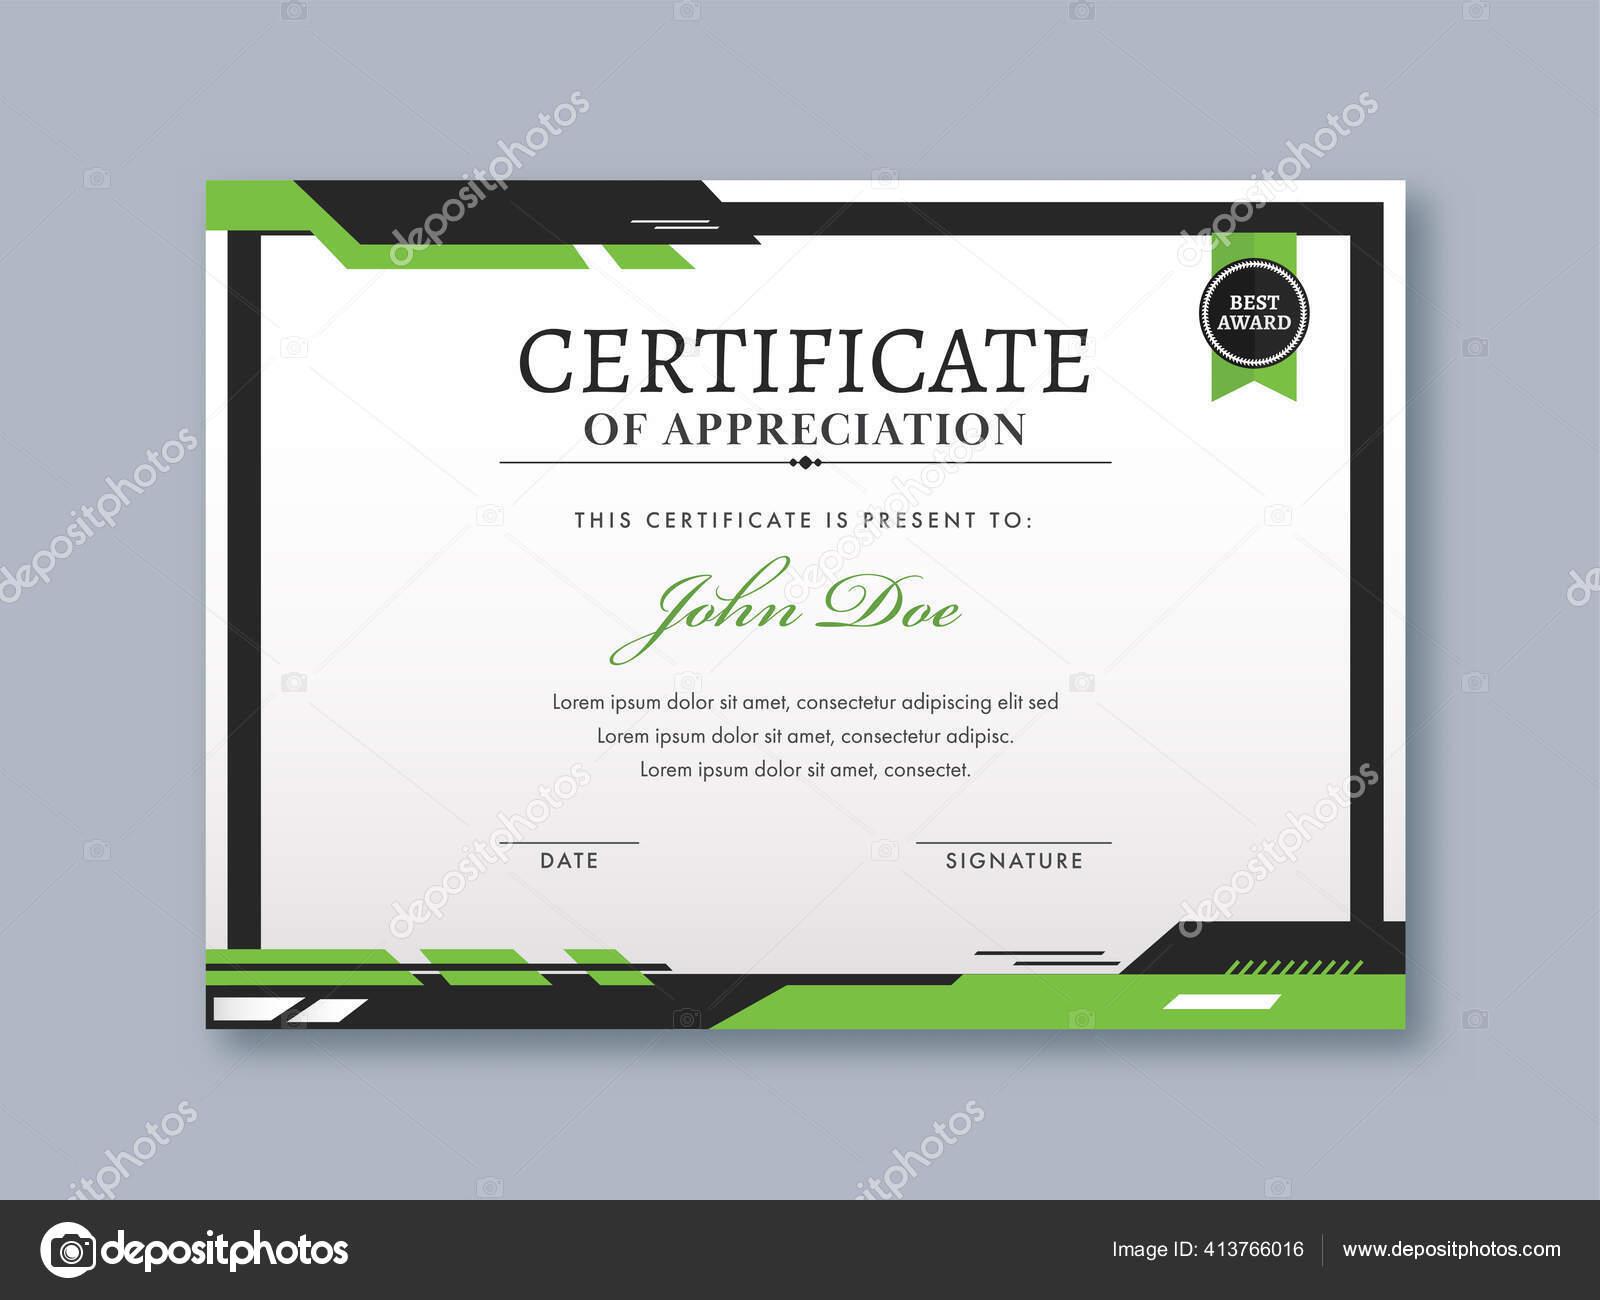 Appreciation Certificate Template Design White Green Color Vector Image By C Alliesinteract Vector Stock 413766016